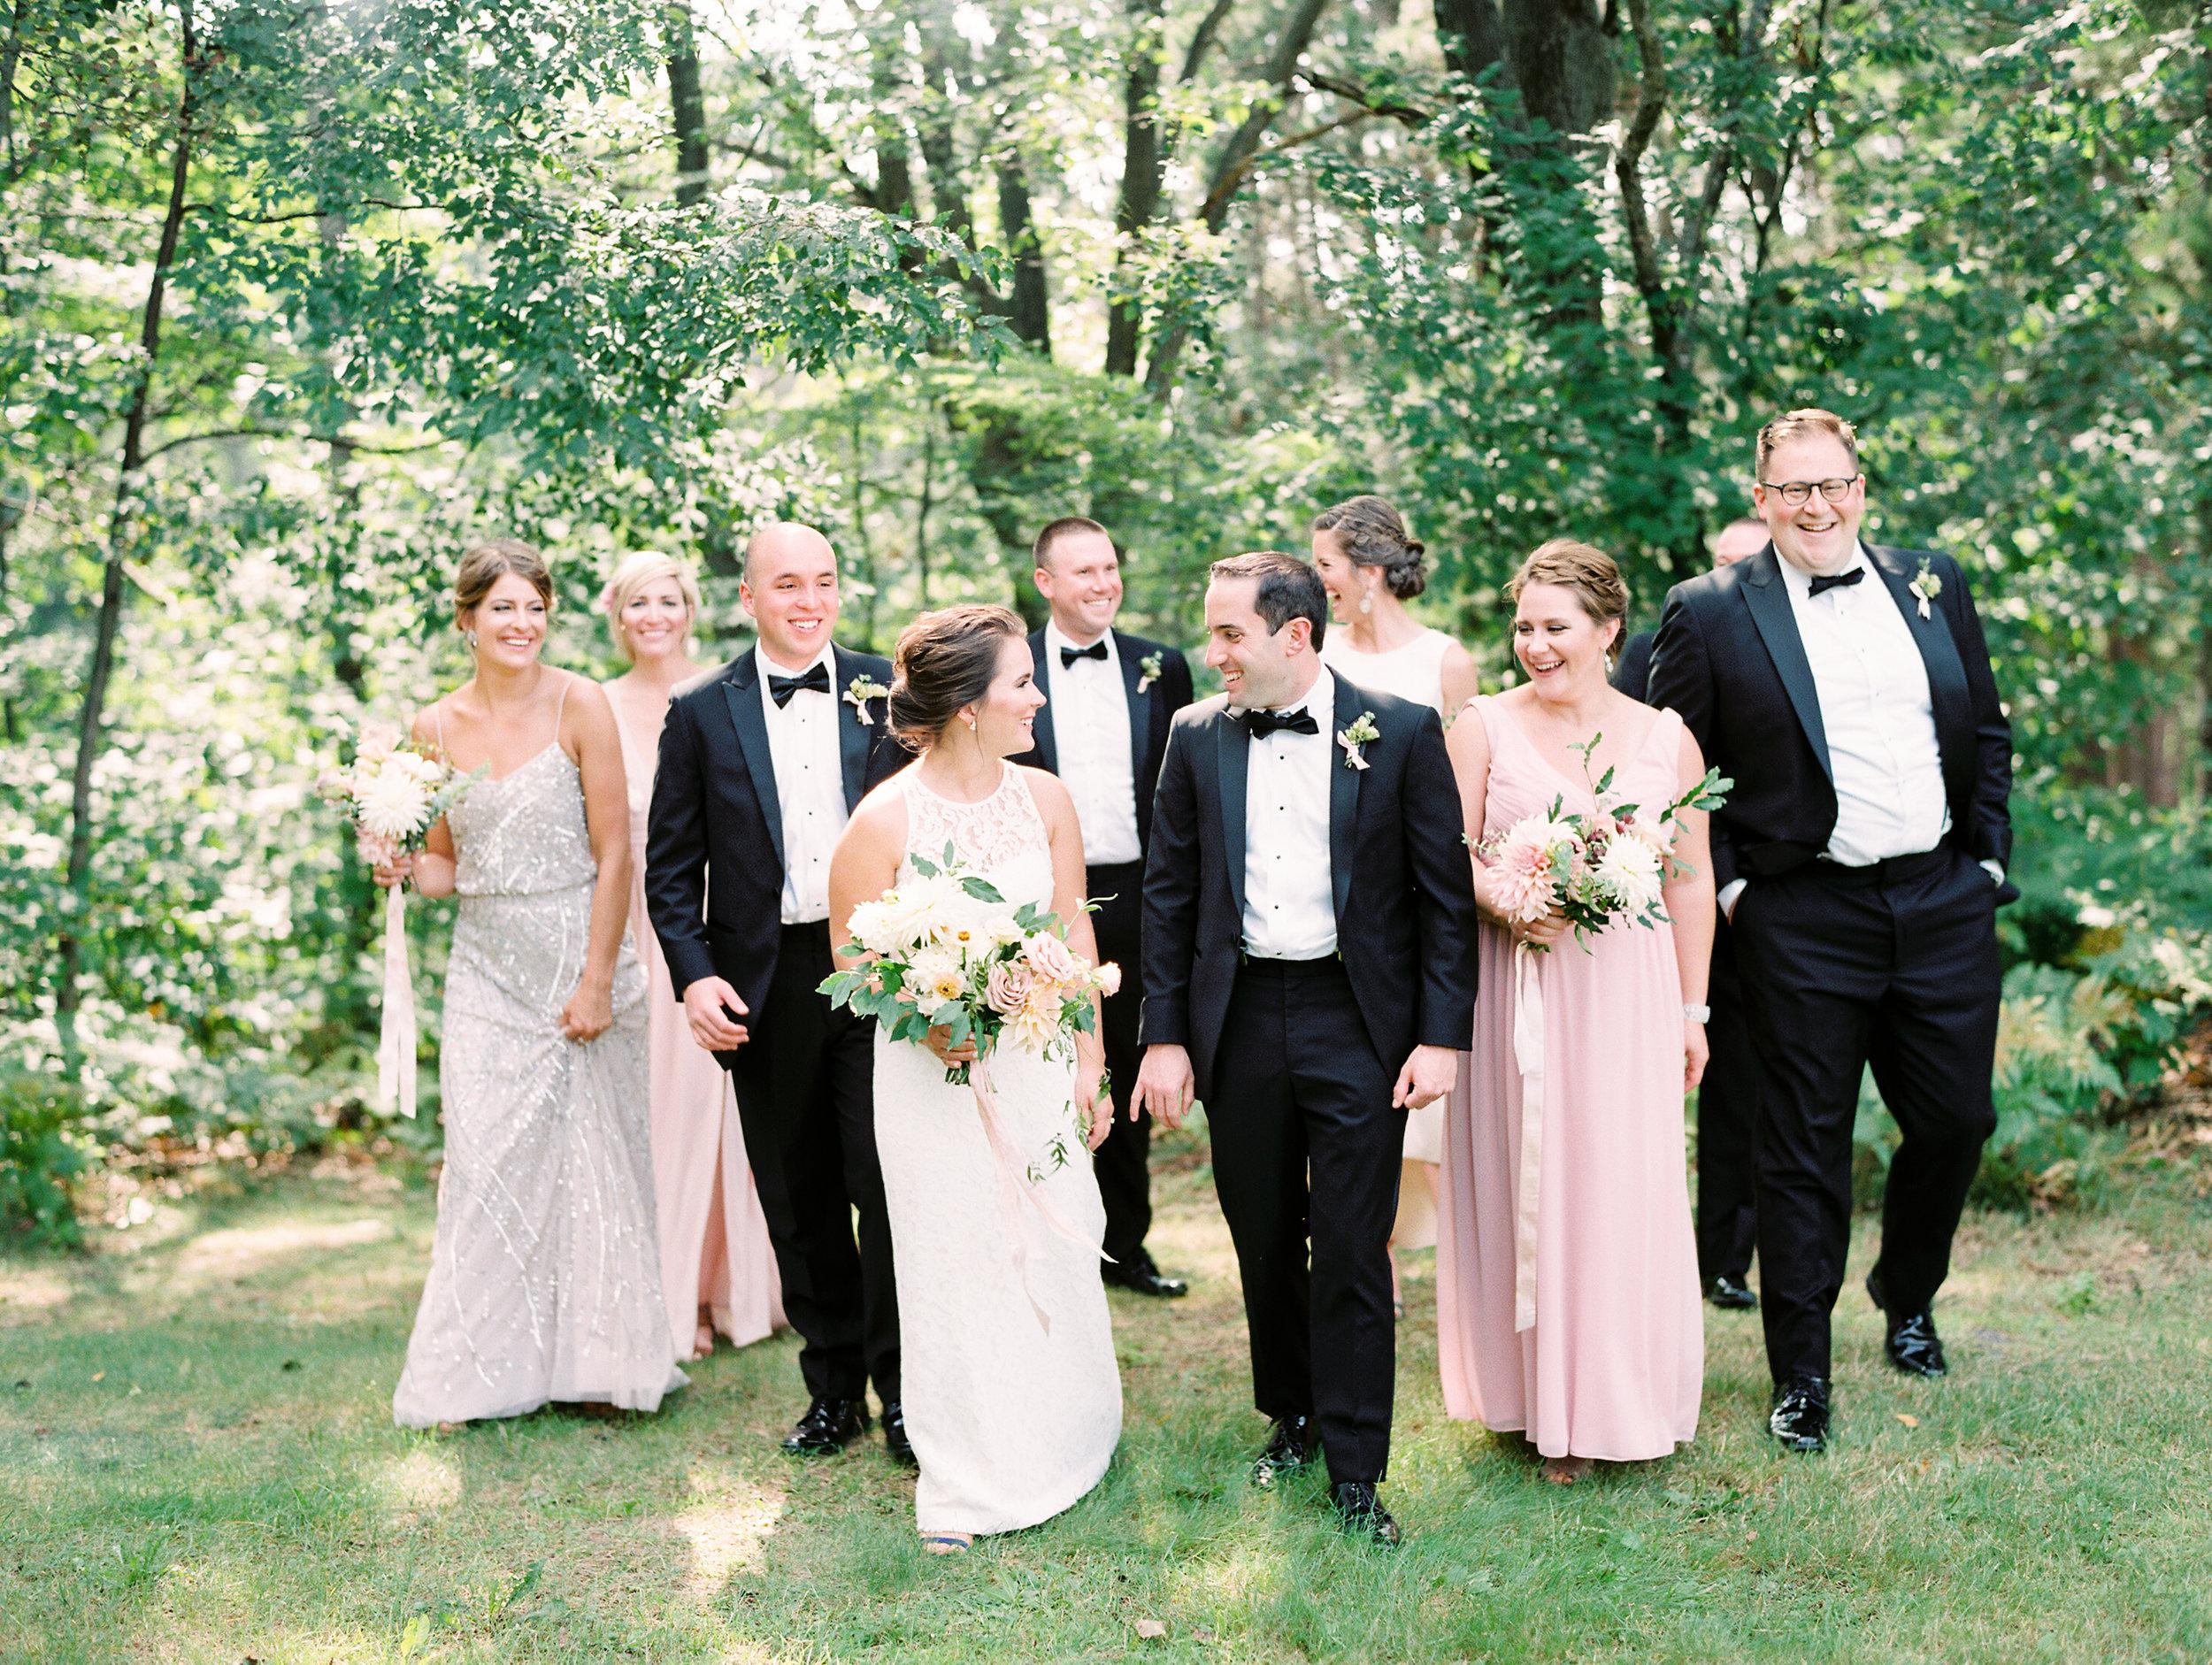 Zoller+Wedding+Bridal+Partyf-82.jpg